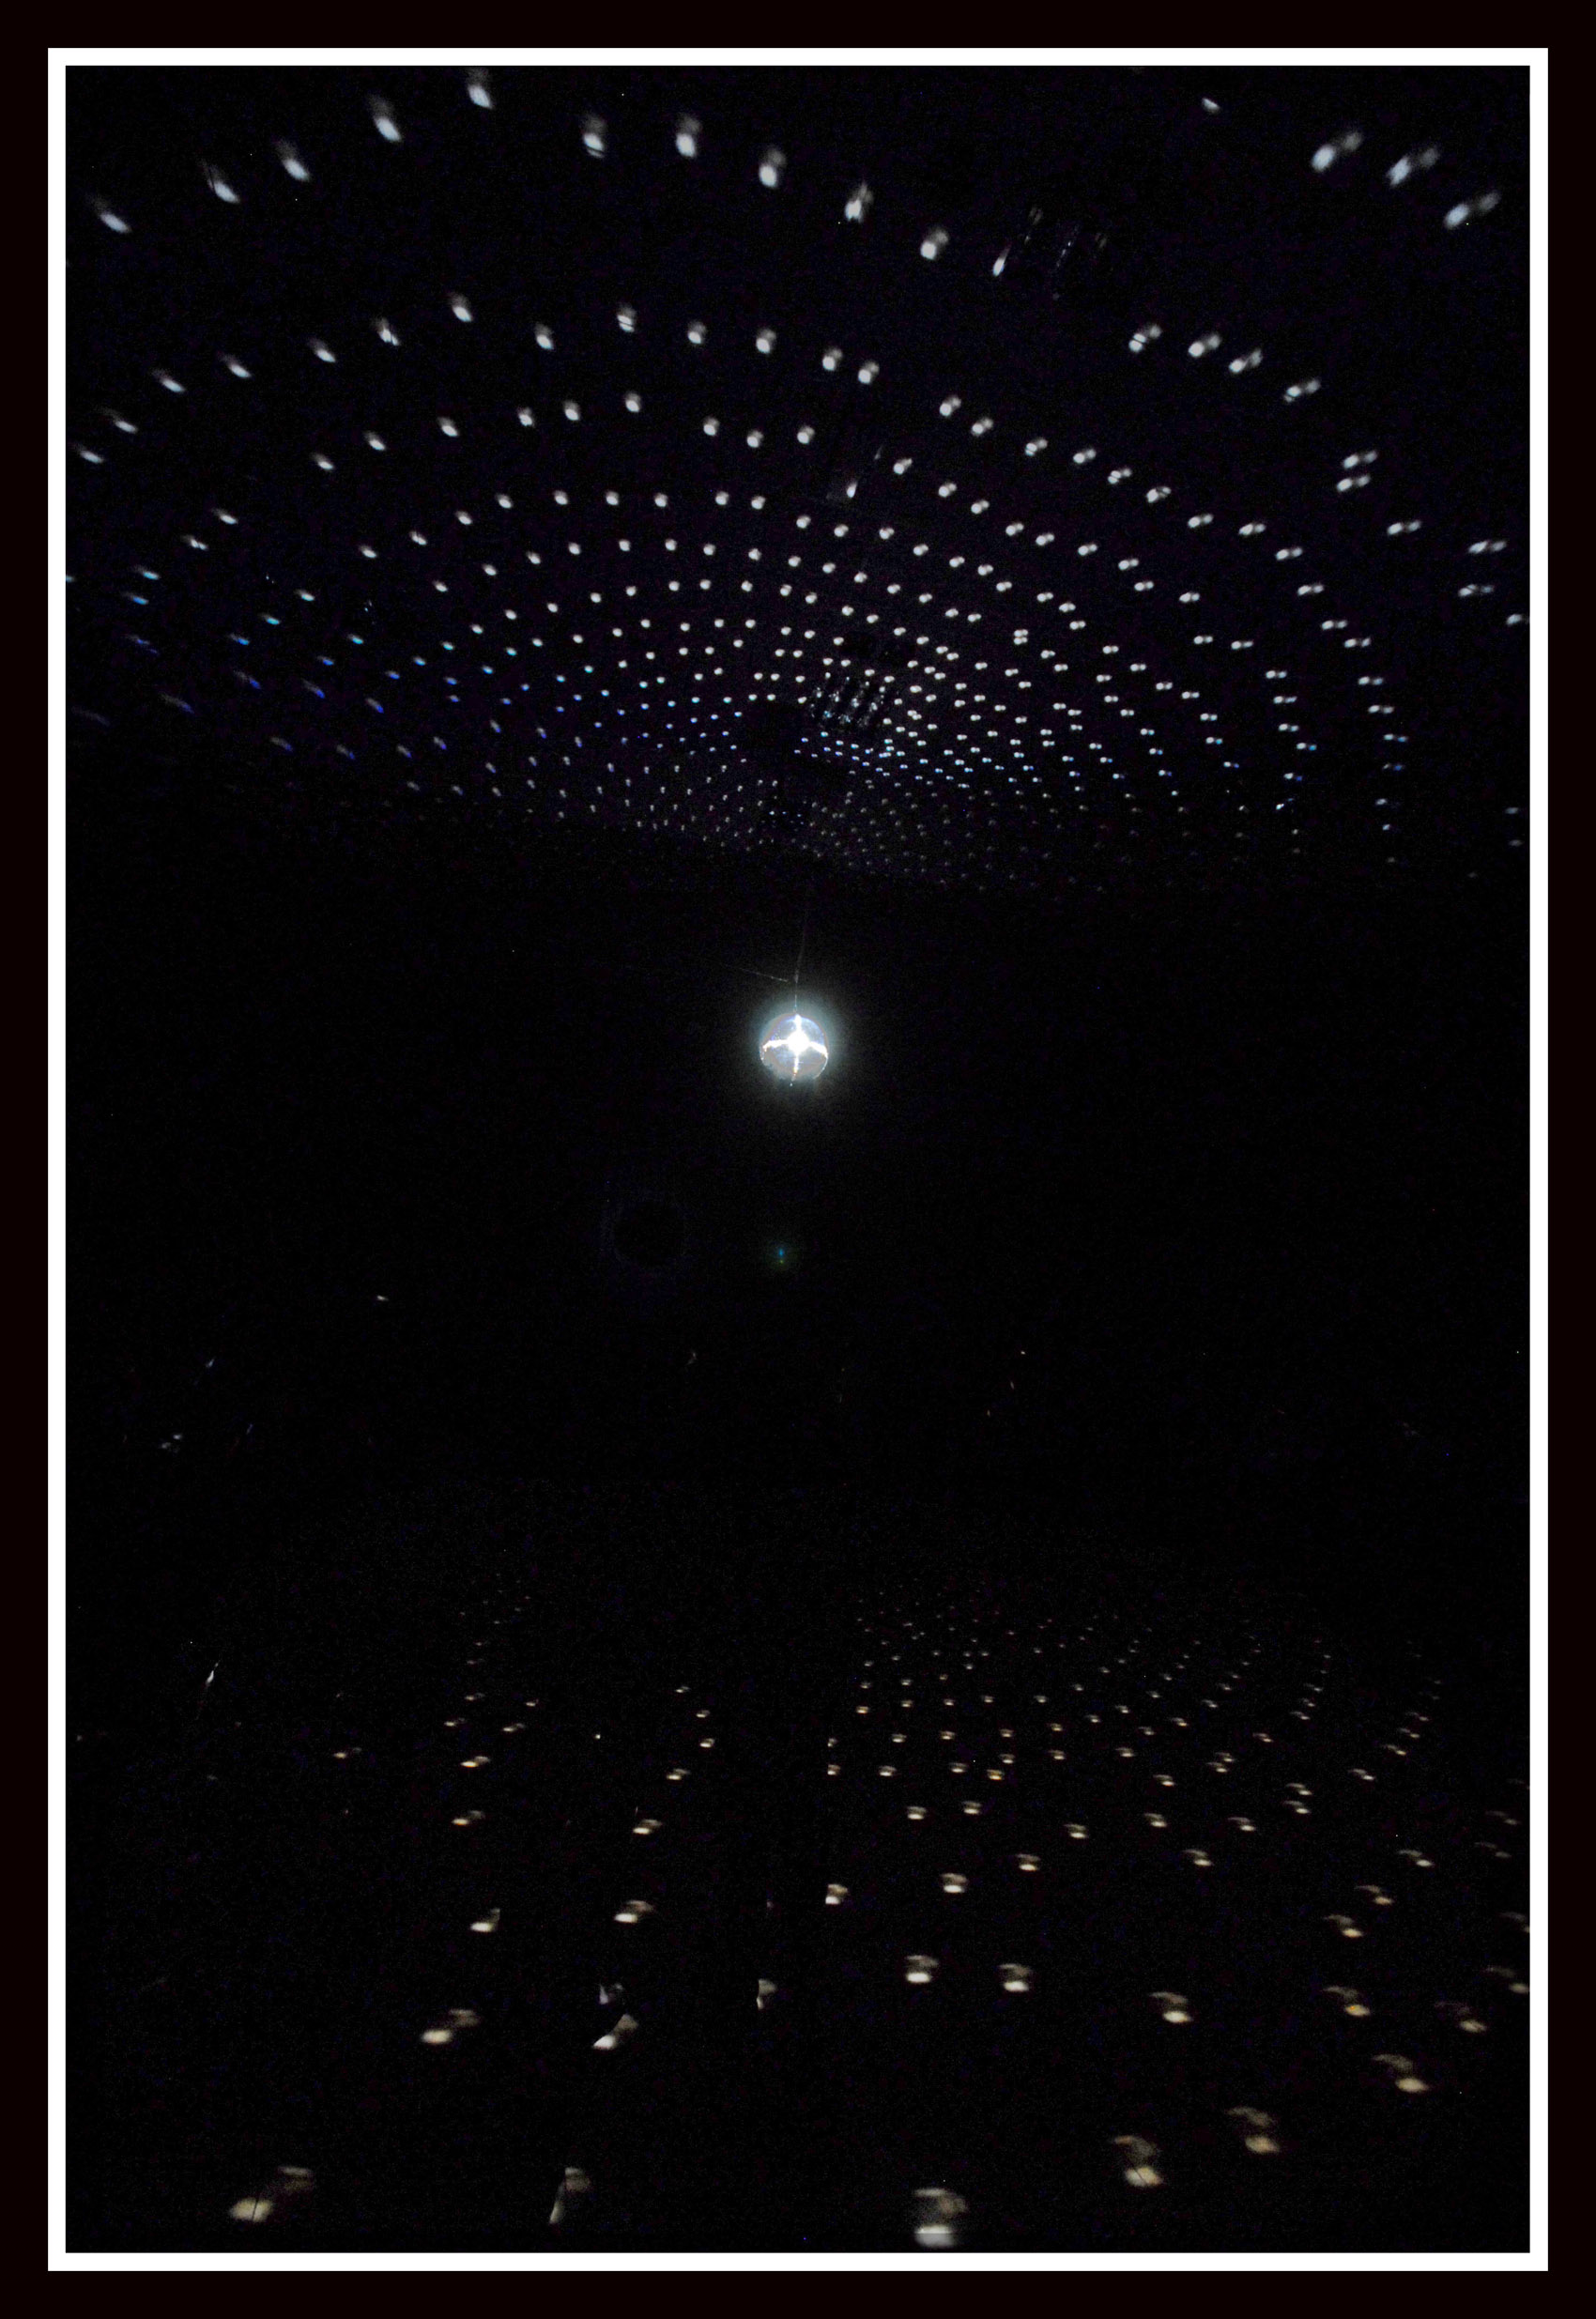 starlight_opening_16